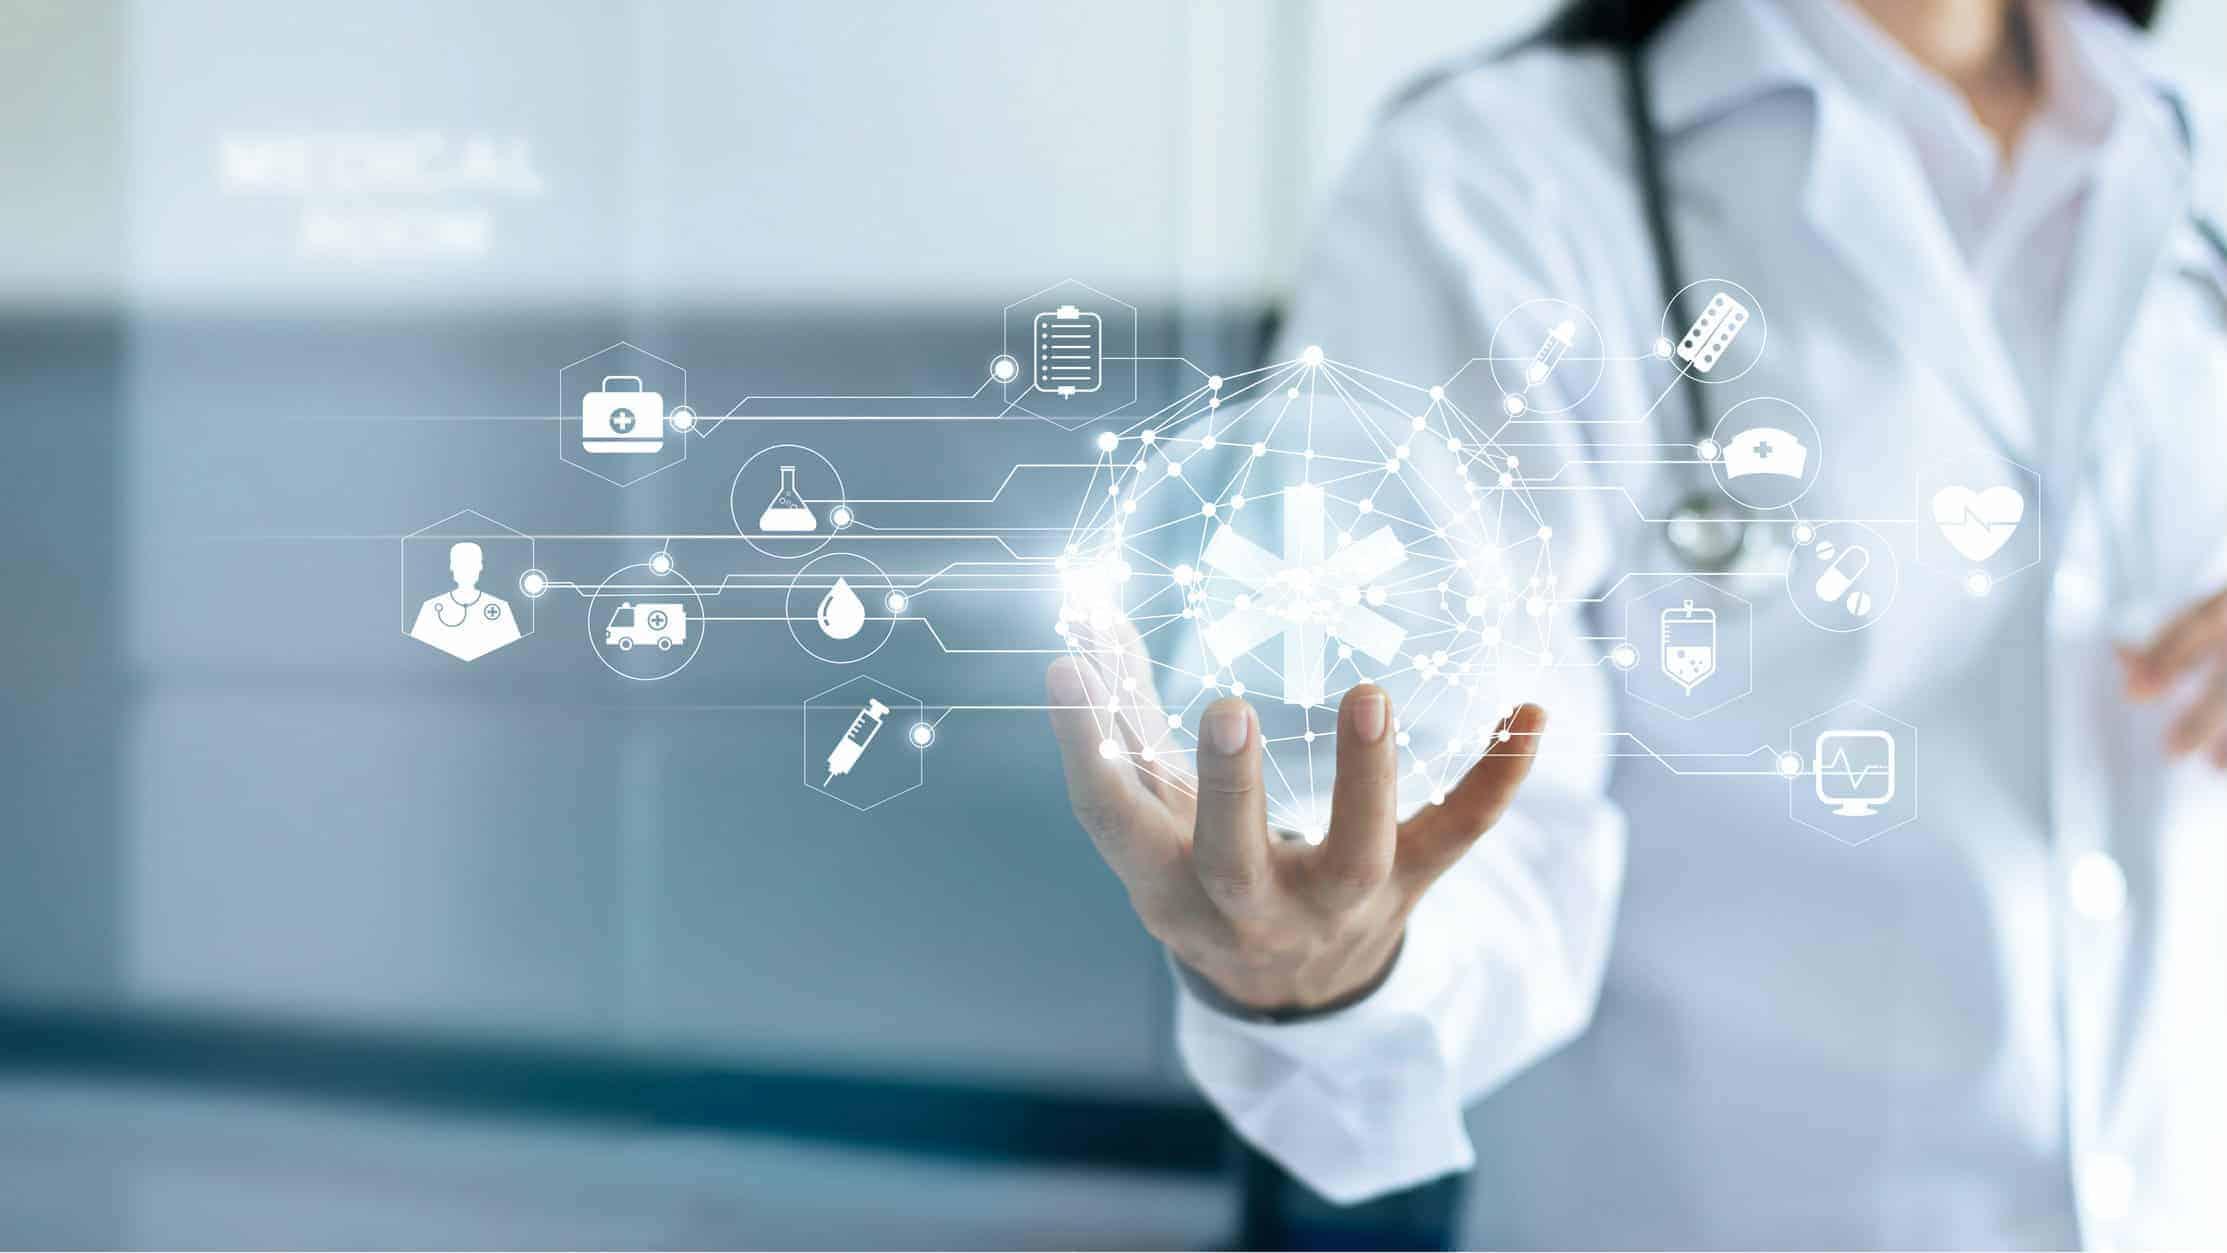 Health technology shares